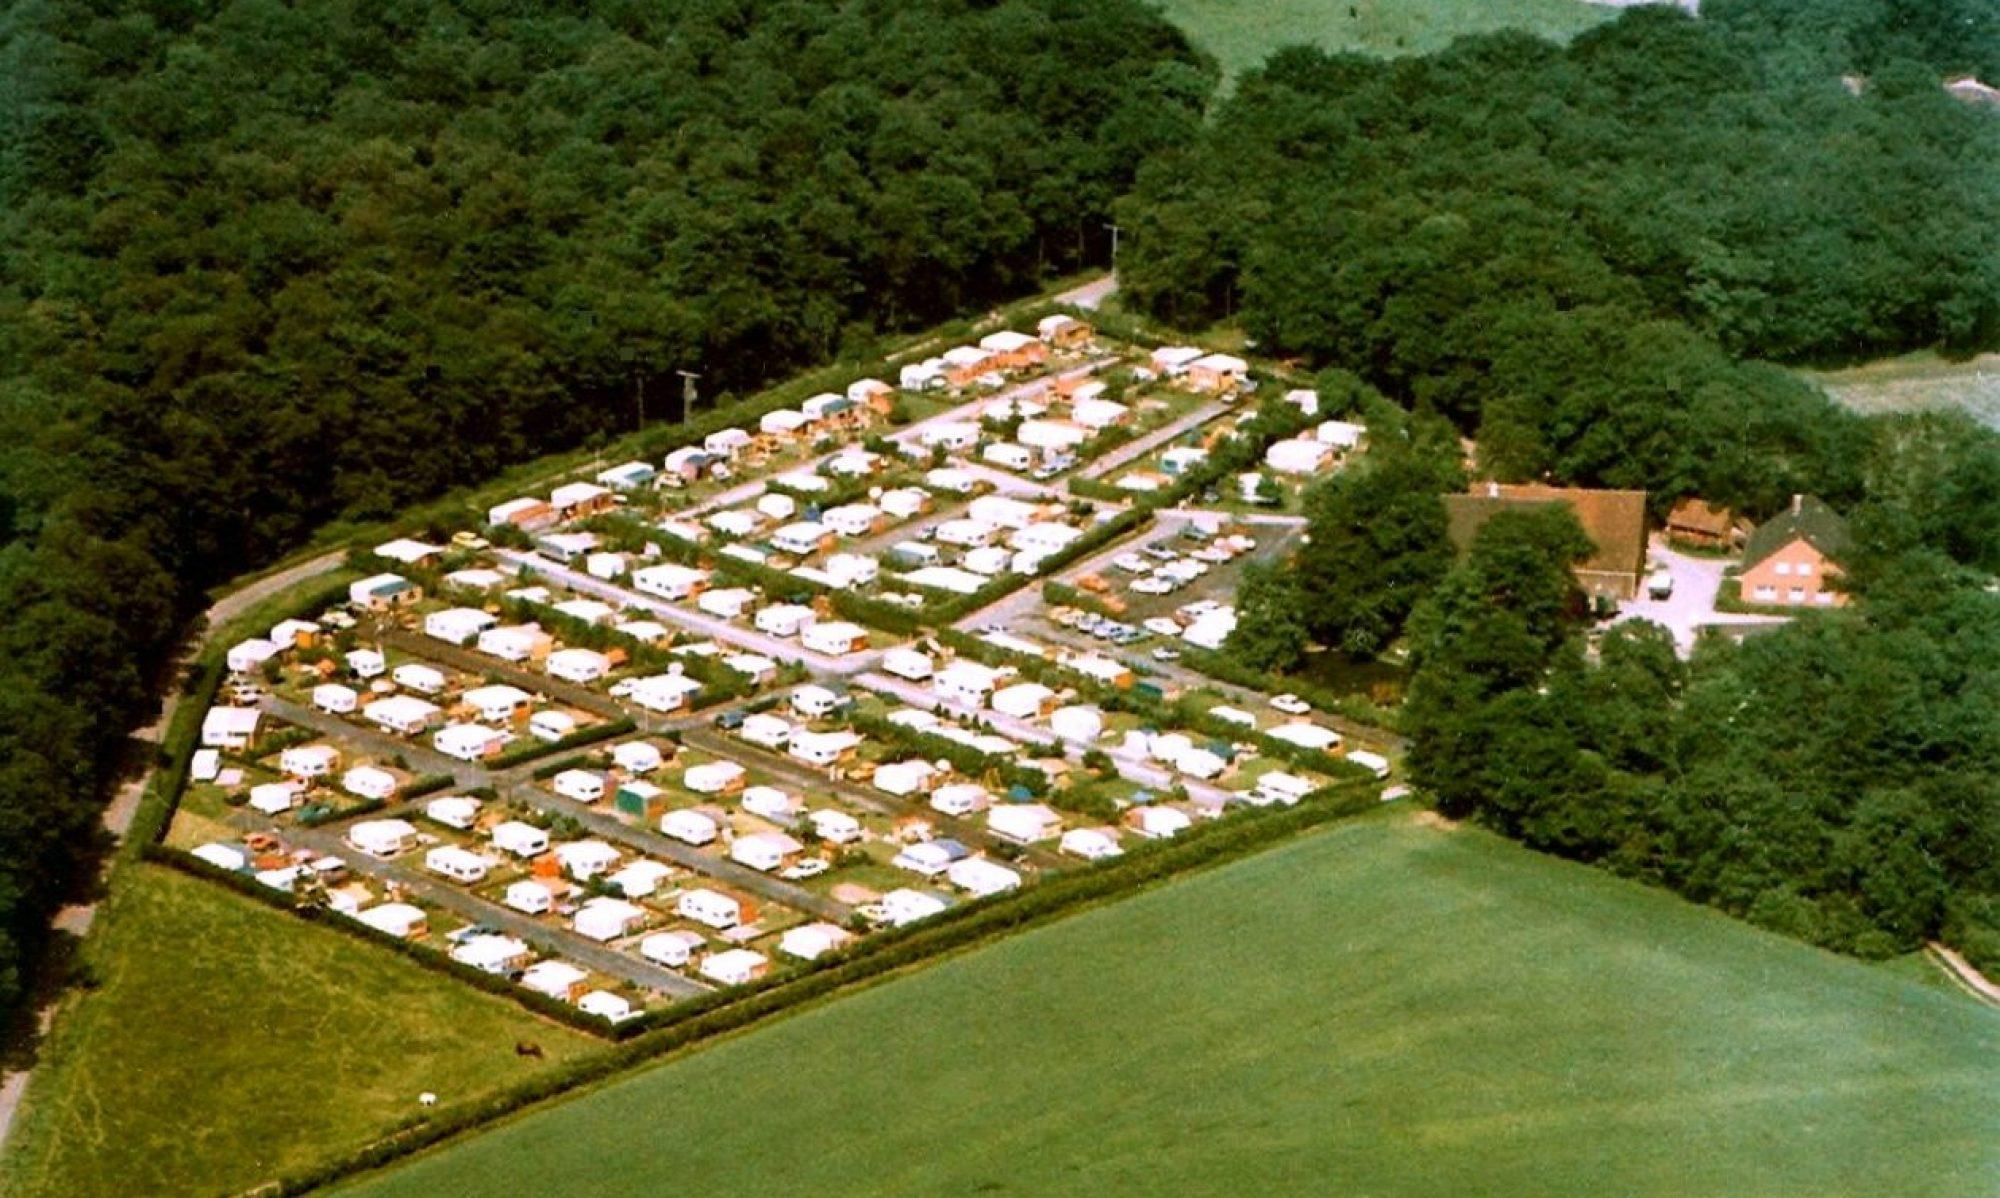 Camping in Waltrop